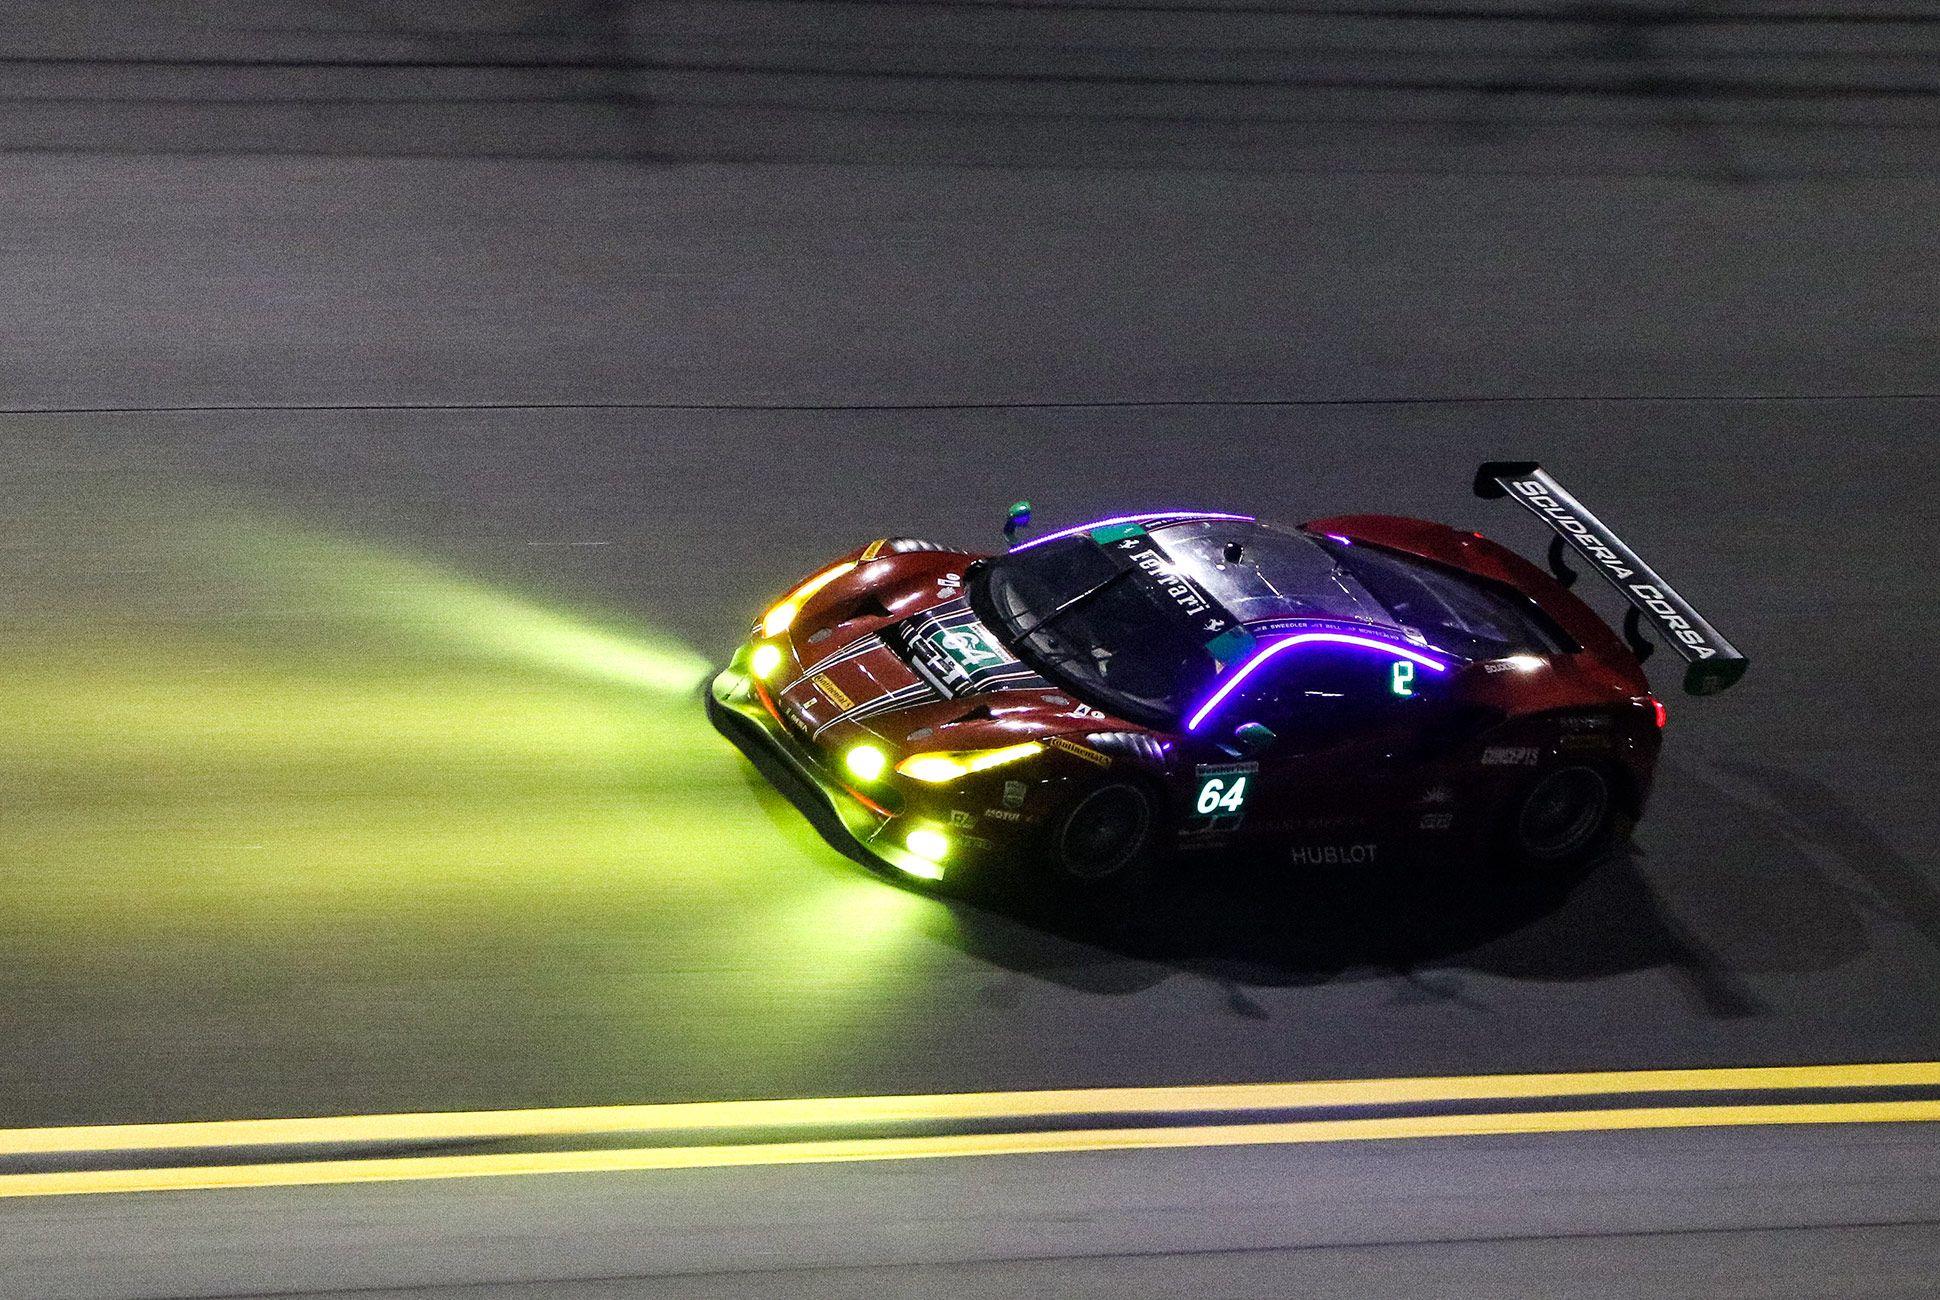 Best-Sports-Cars-of-2018-Daytona-24-Hours-gear-patrol-Ferrari-488-GTE-3